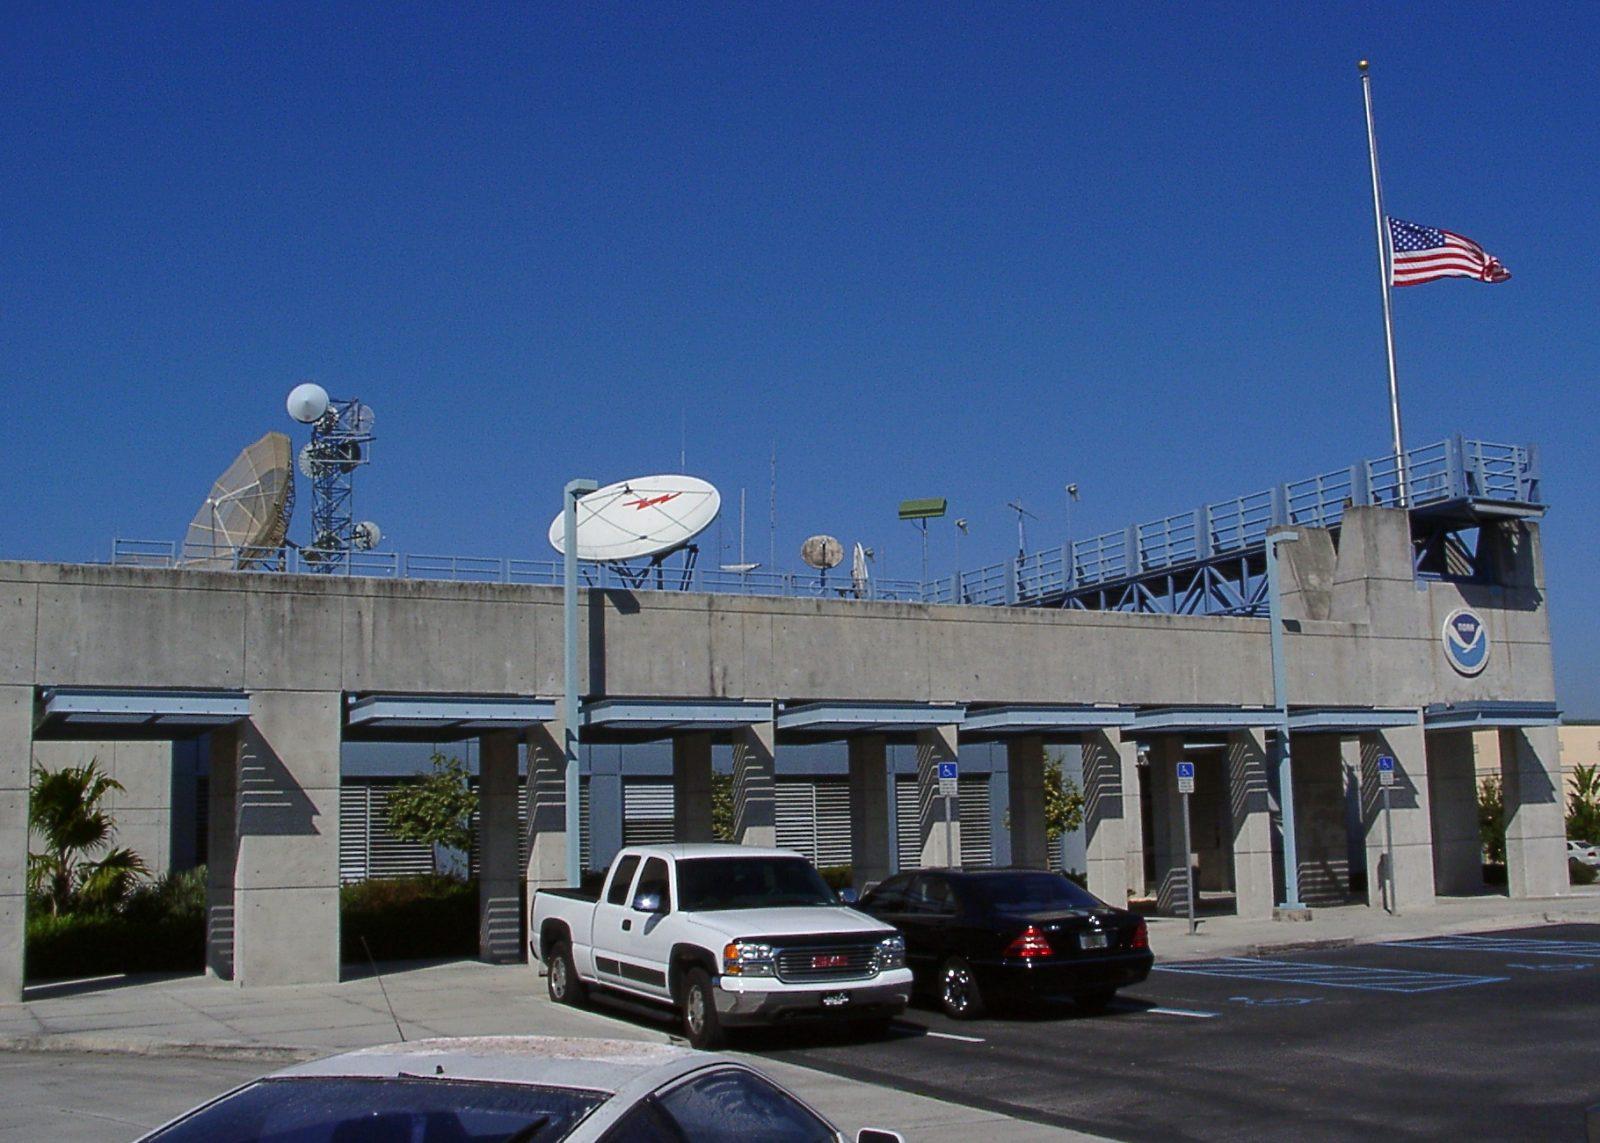 High tech NHC meteorologist station circa 2003